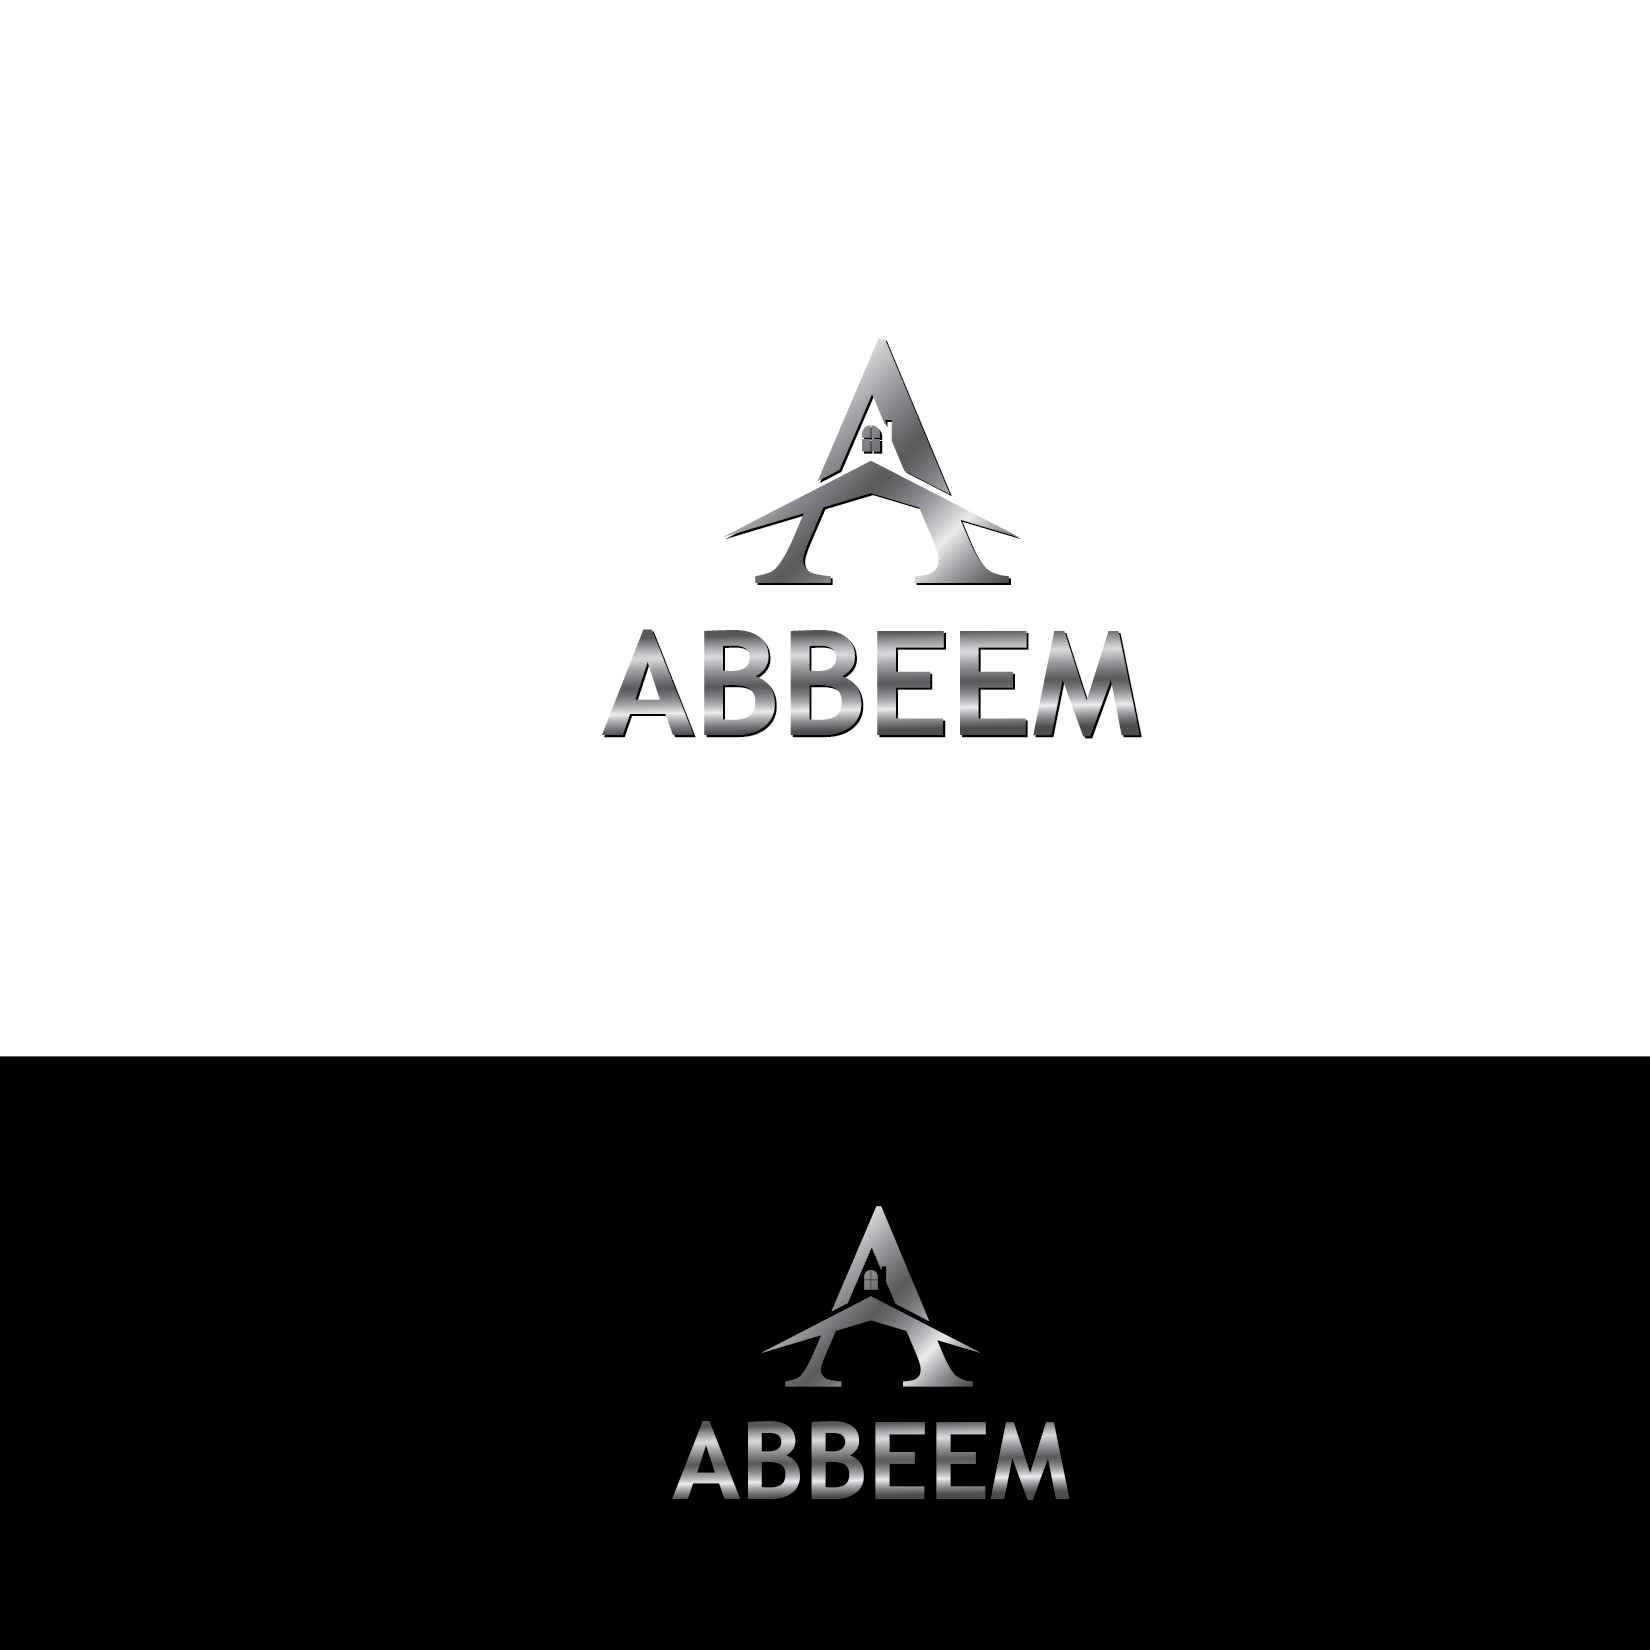 Logo Design by Private User - Entry No. 36 in the Logo Design Contest Luxury Logo Design for Abbeem.